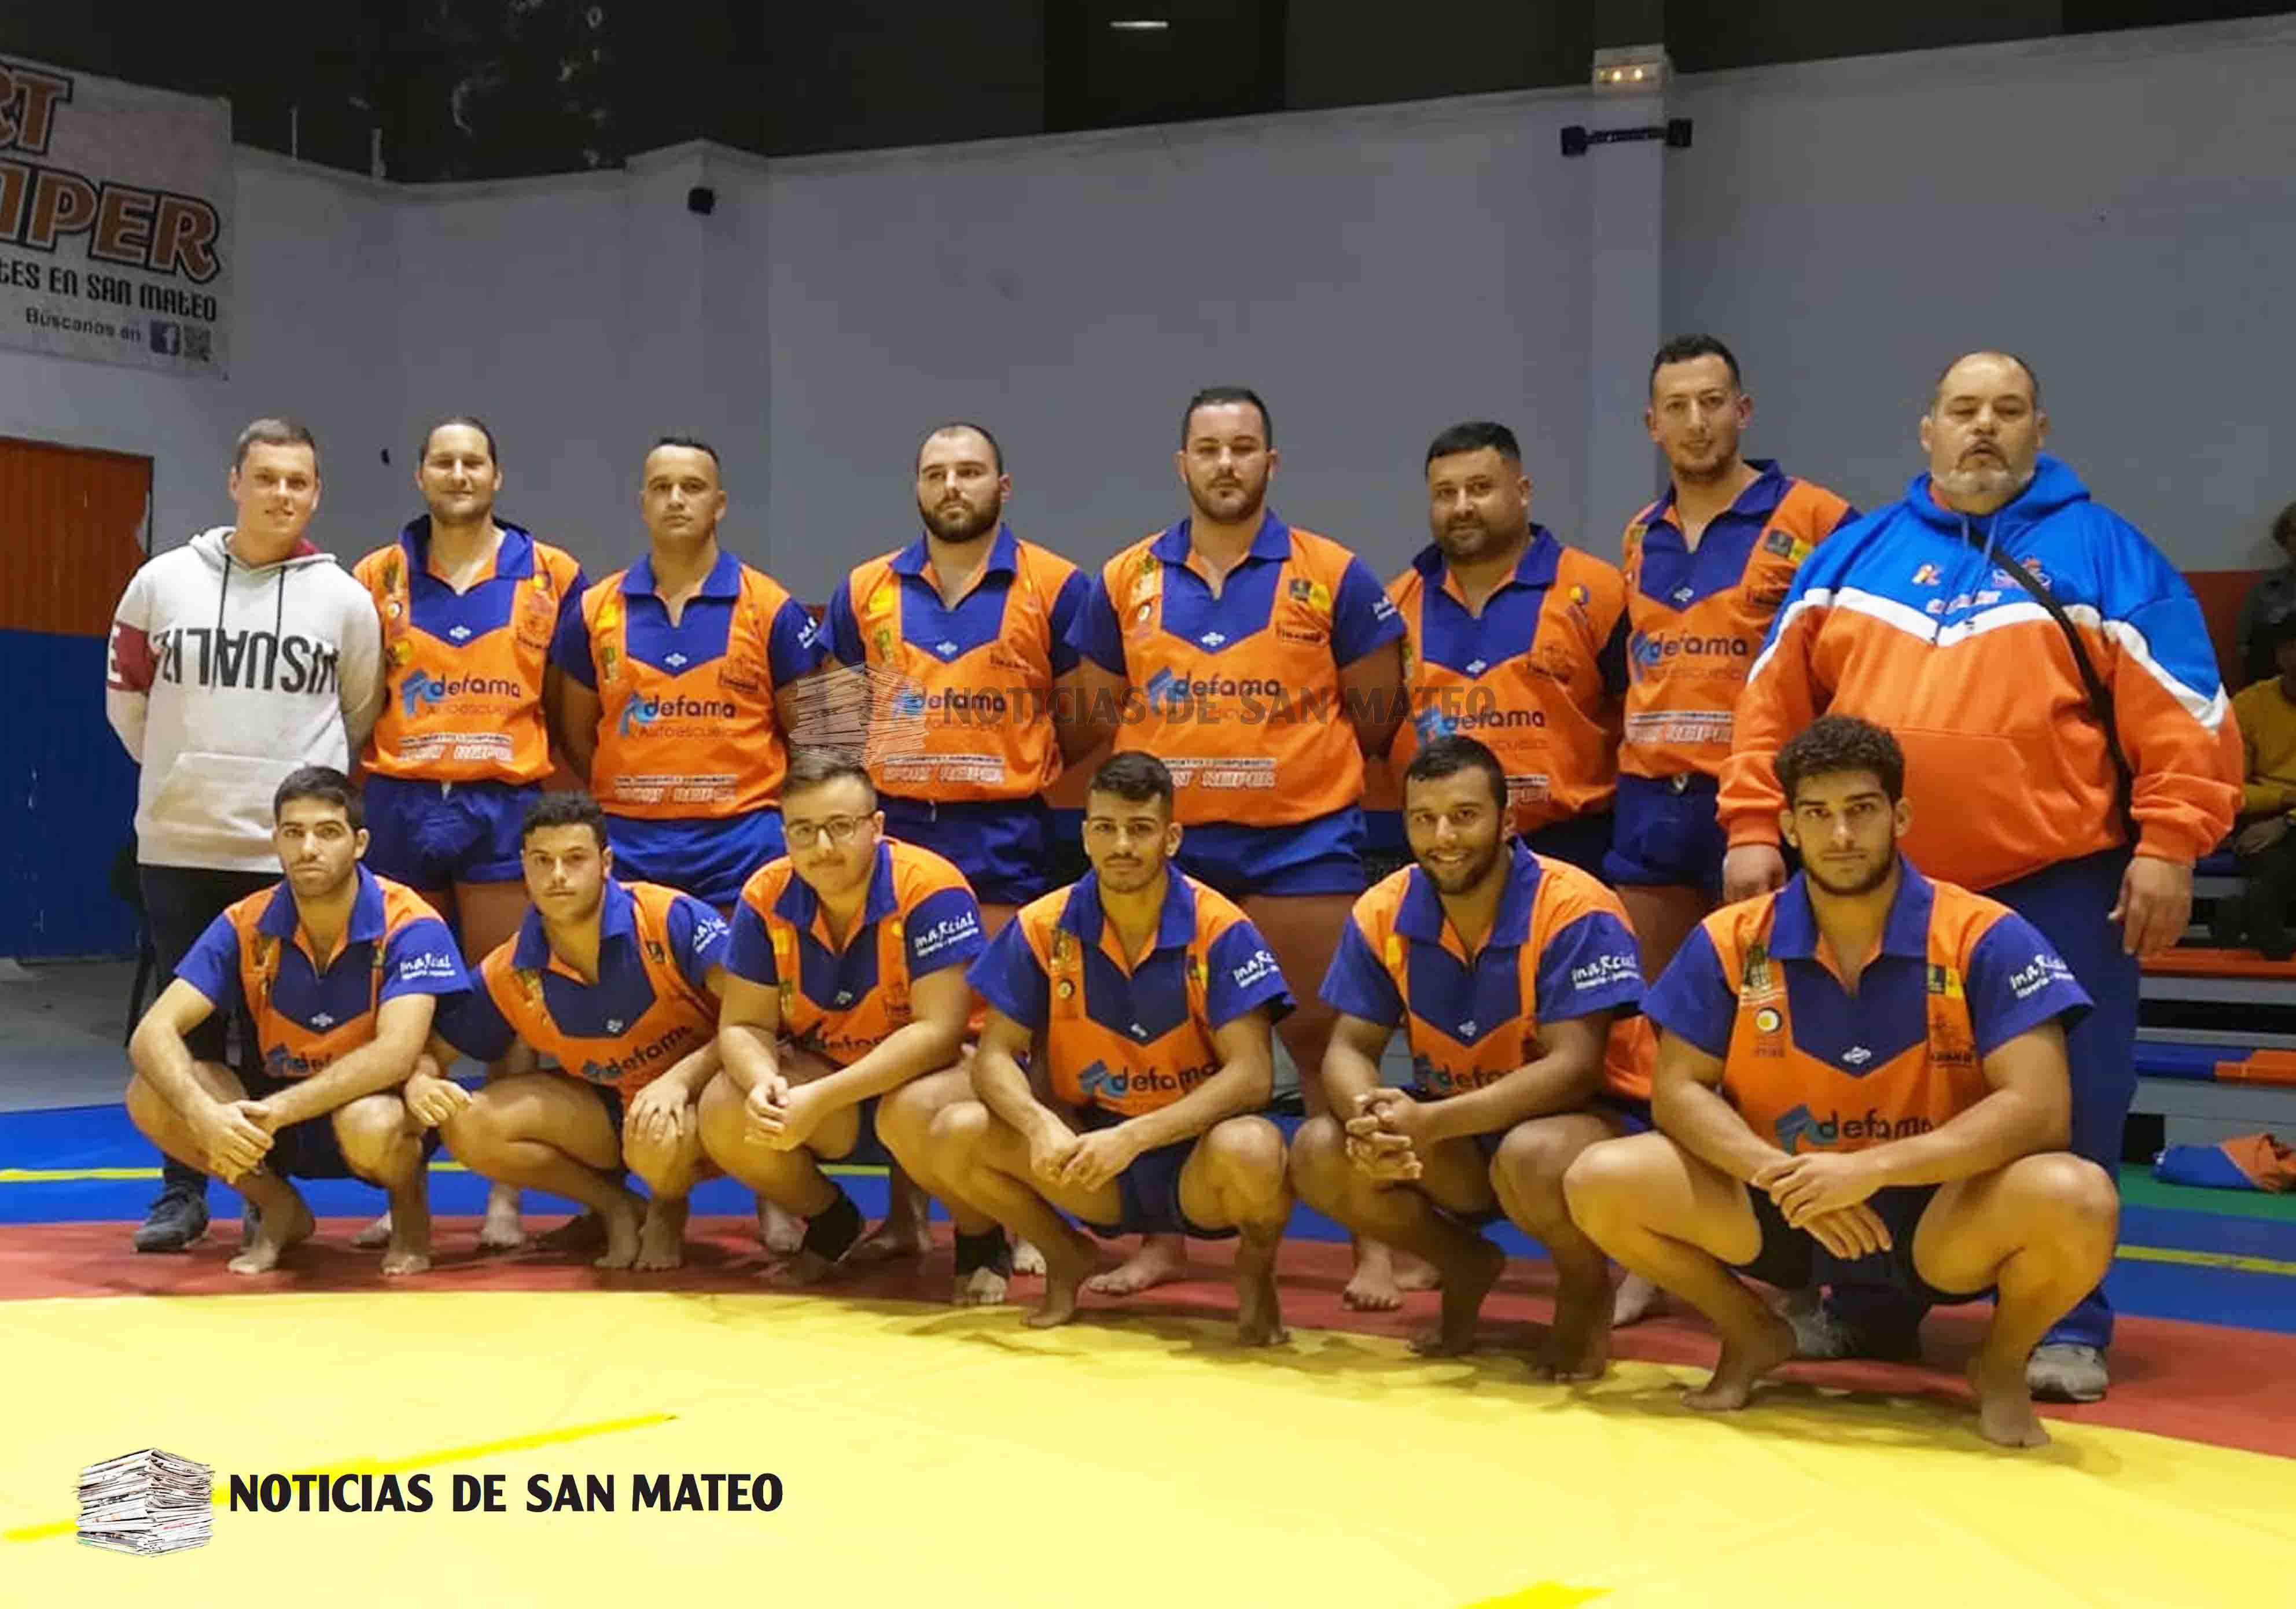 Tinamar 2018 2019 primera luchada liga 26 oct 2018 Foto Noticias de San Mateo